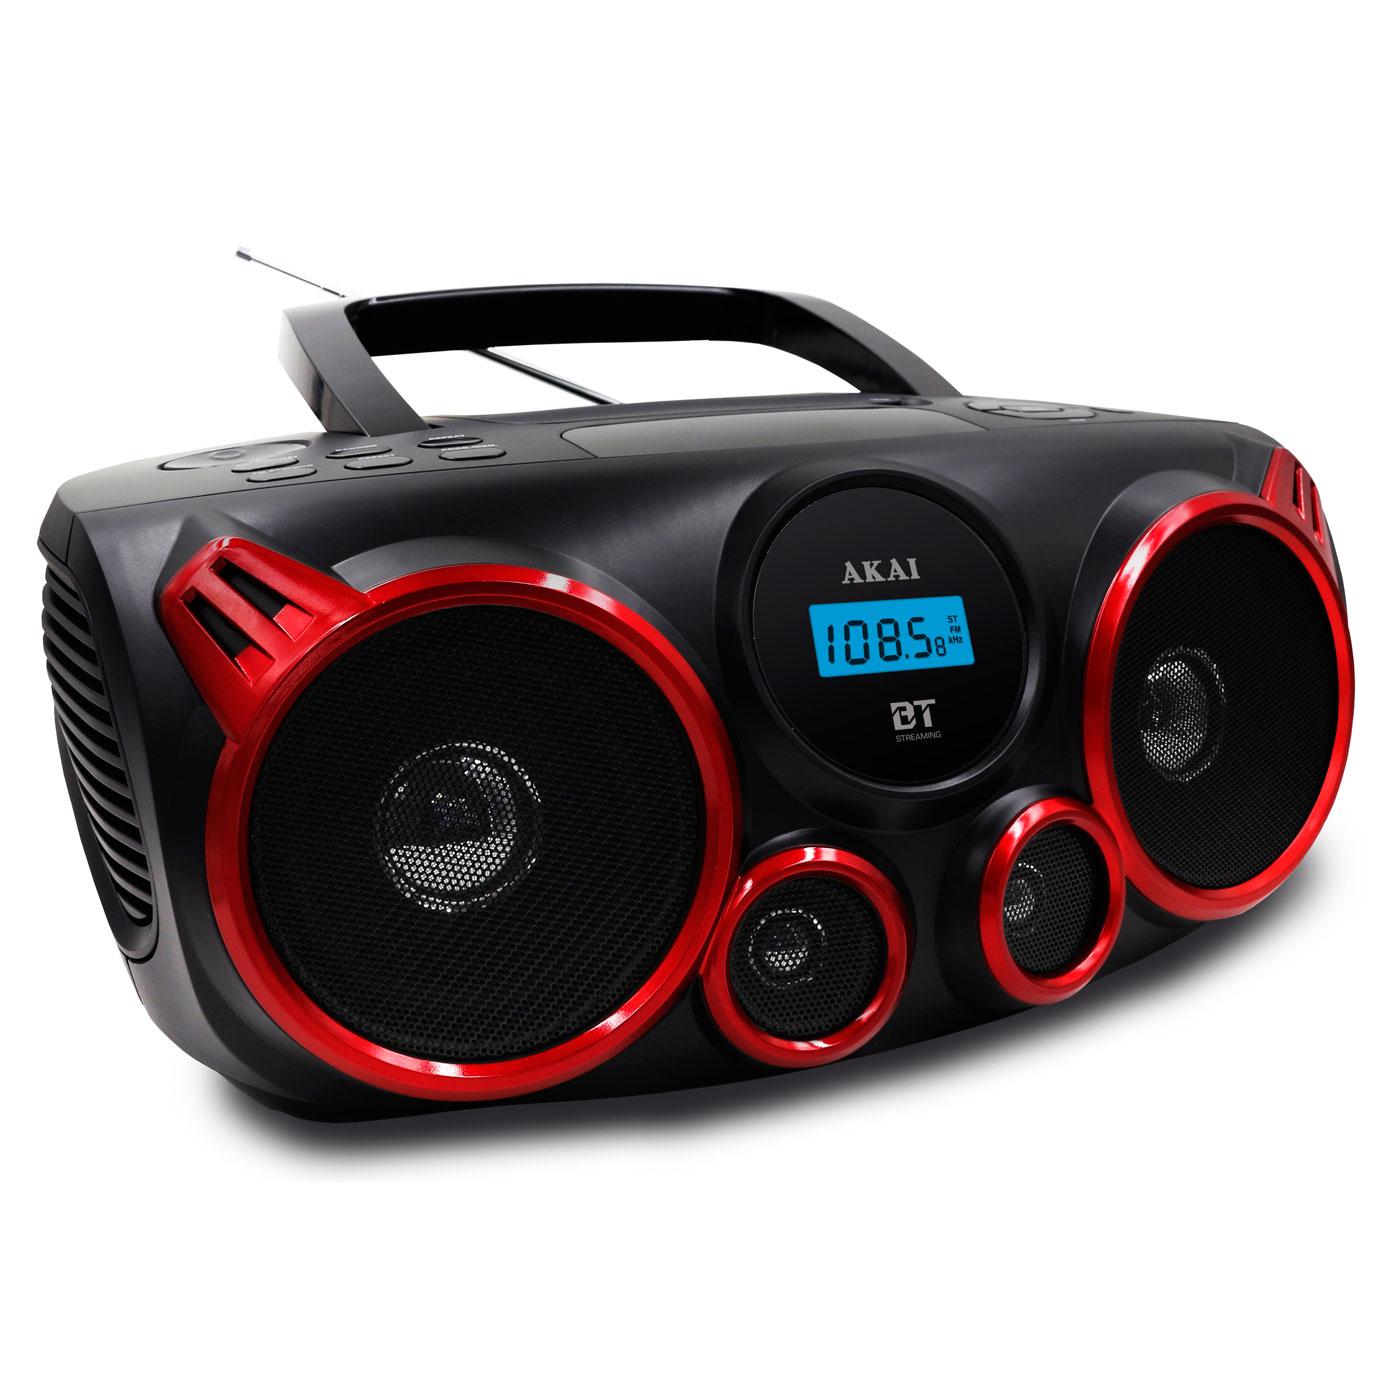 akai ceu 2700bt boombox radio radio r veil aka sur ldlc. Black Bedroom Furniture Sets. Home Design Ideas